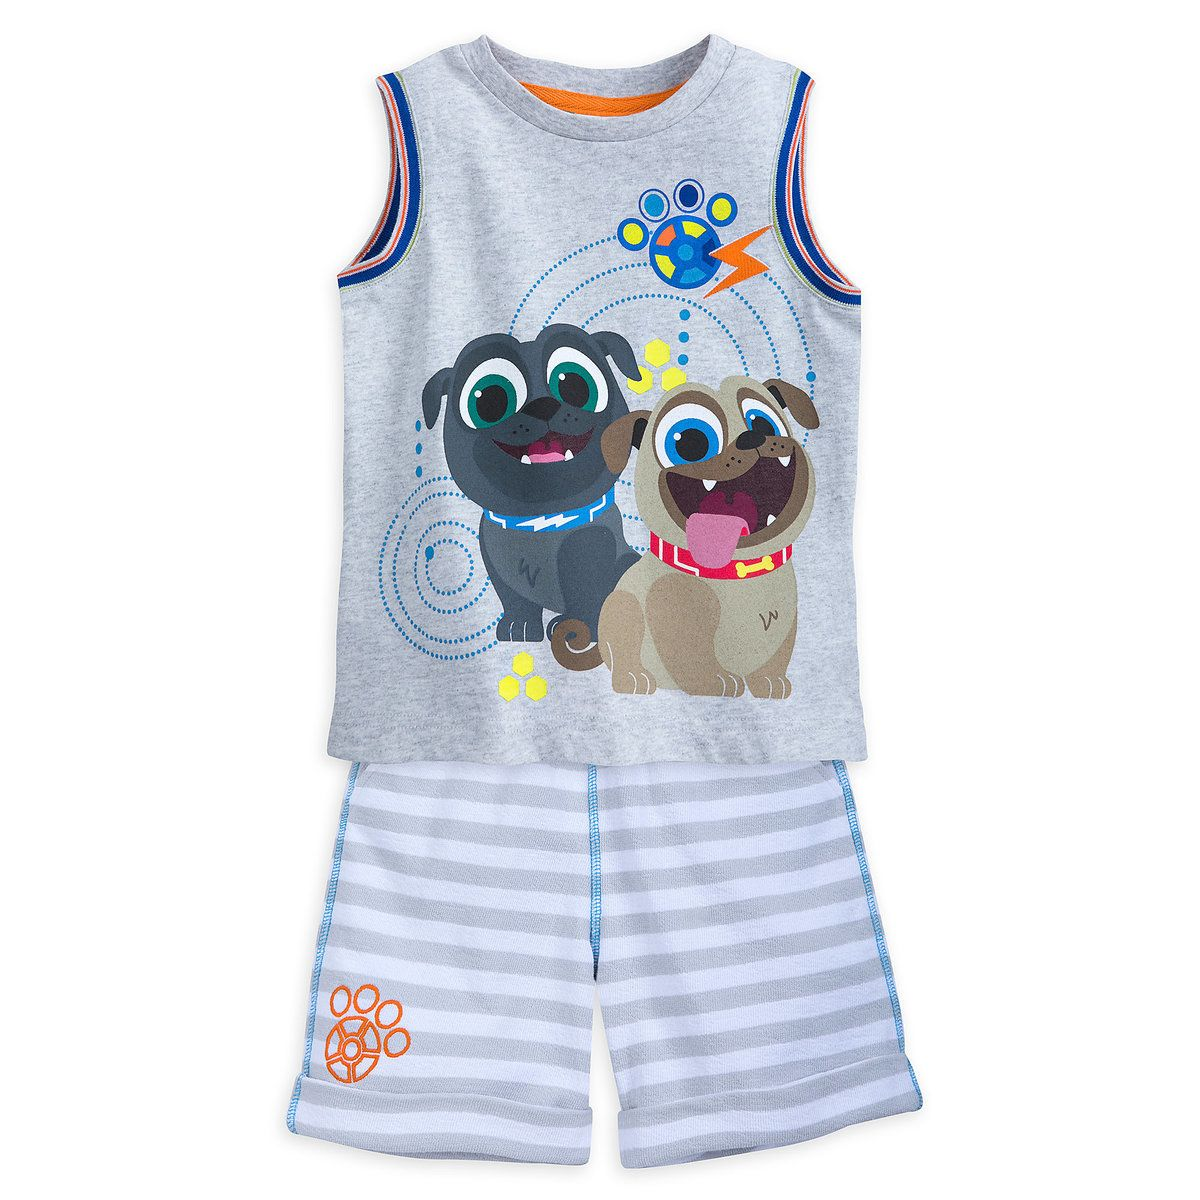 New w// Tags Disney Puppy Dog Pals 2 piece shorts set